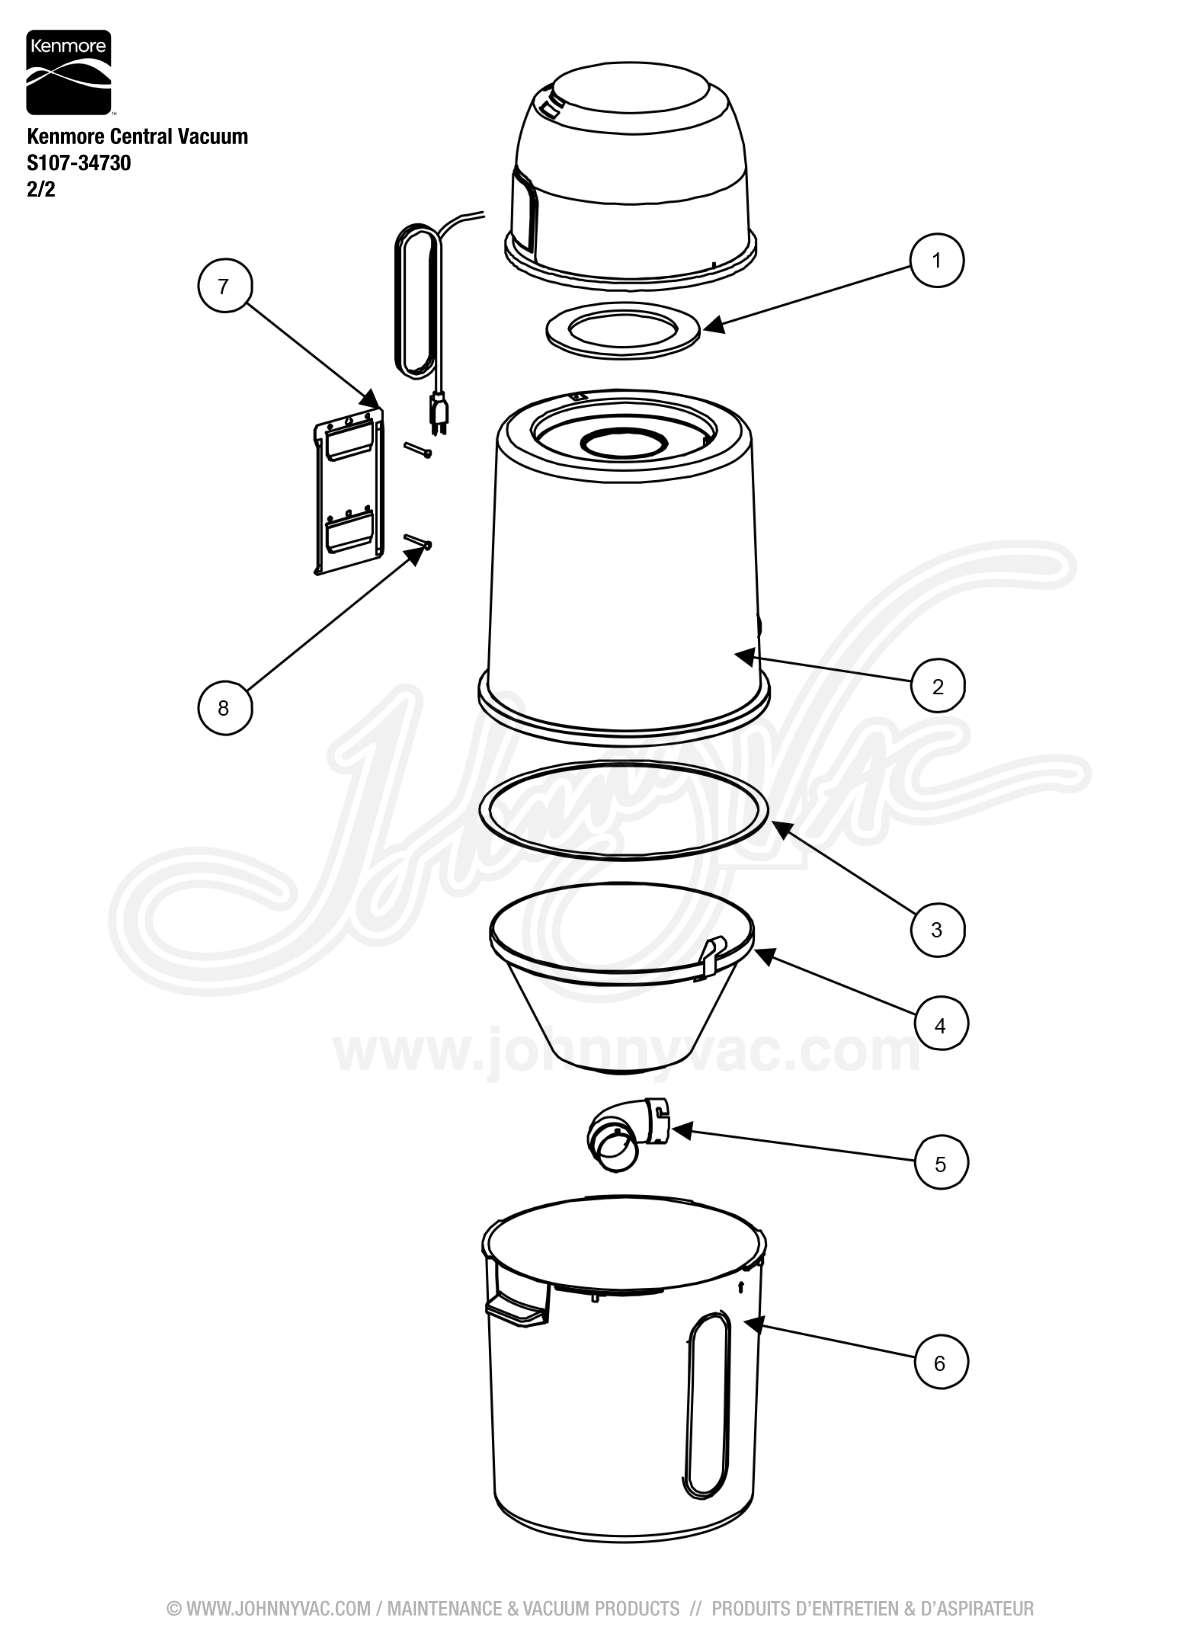 Kenmore Central Vacuum Wiring Diagram